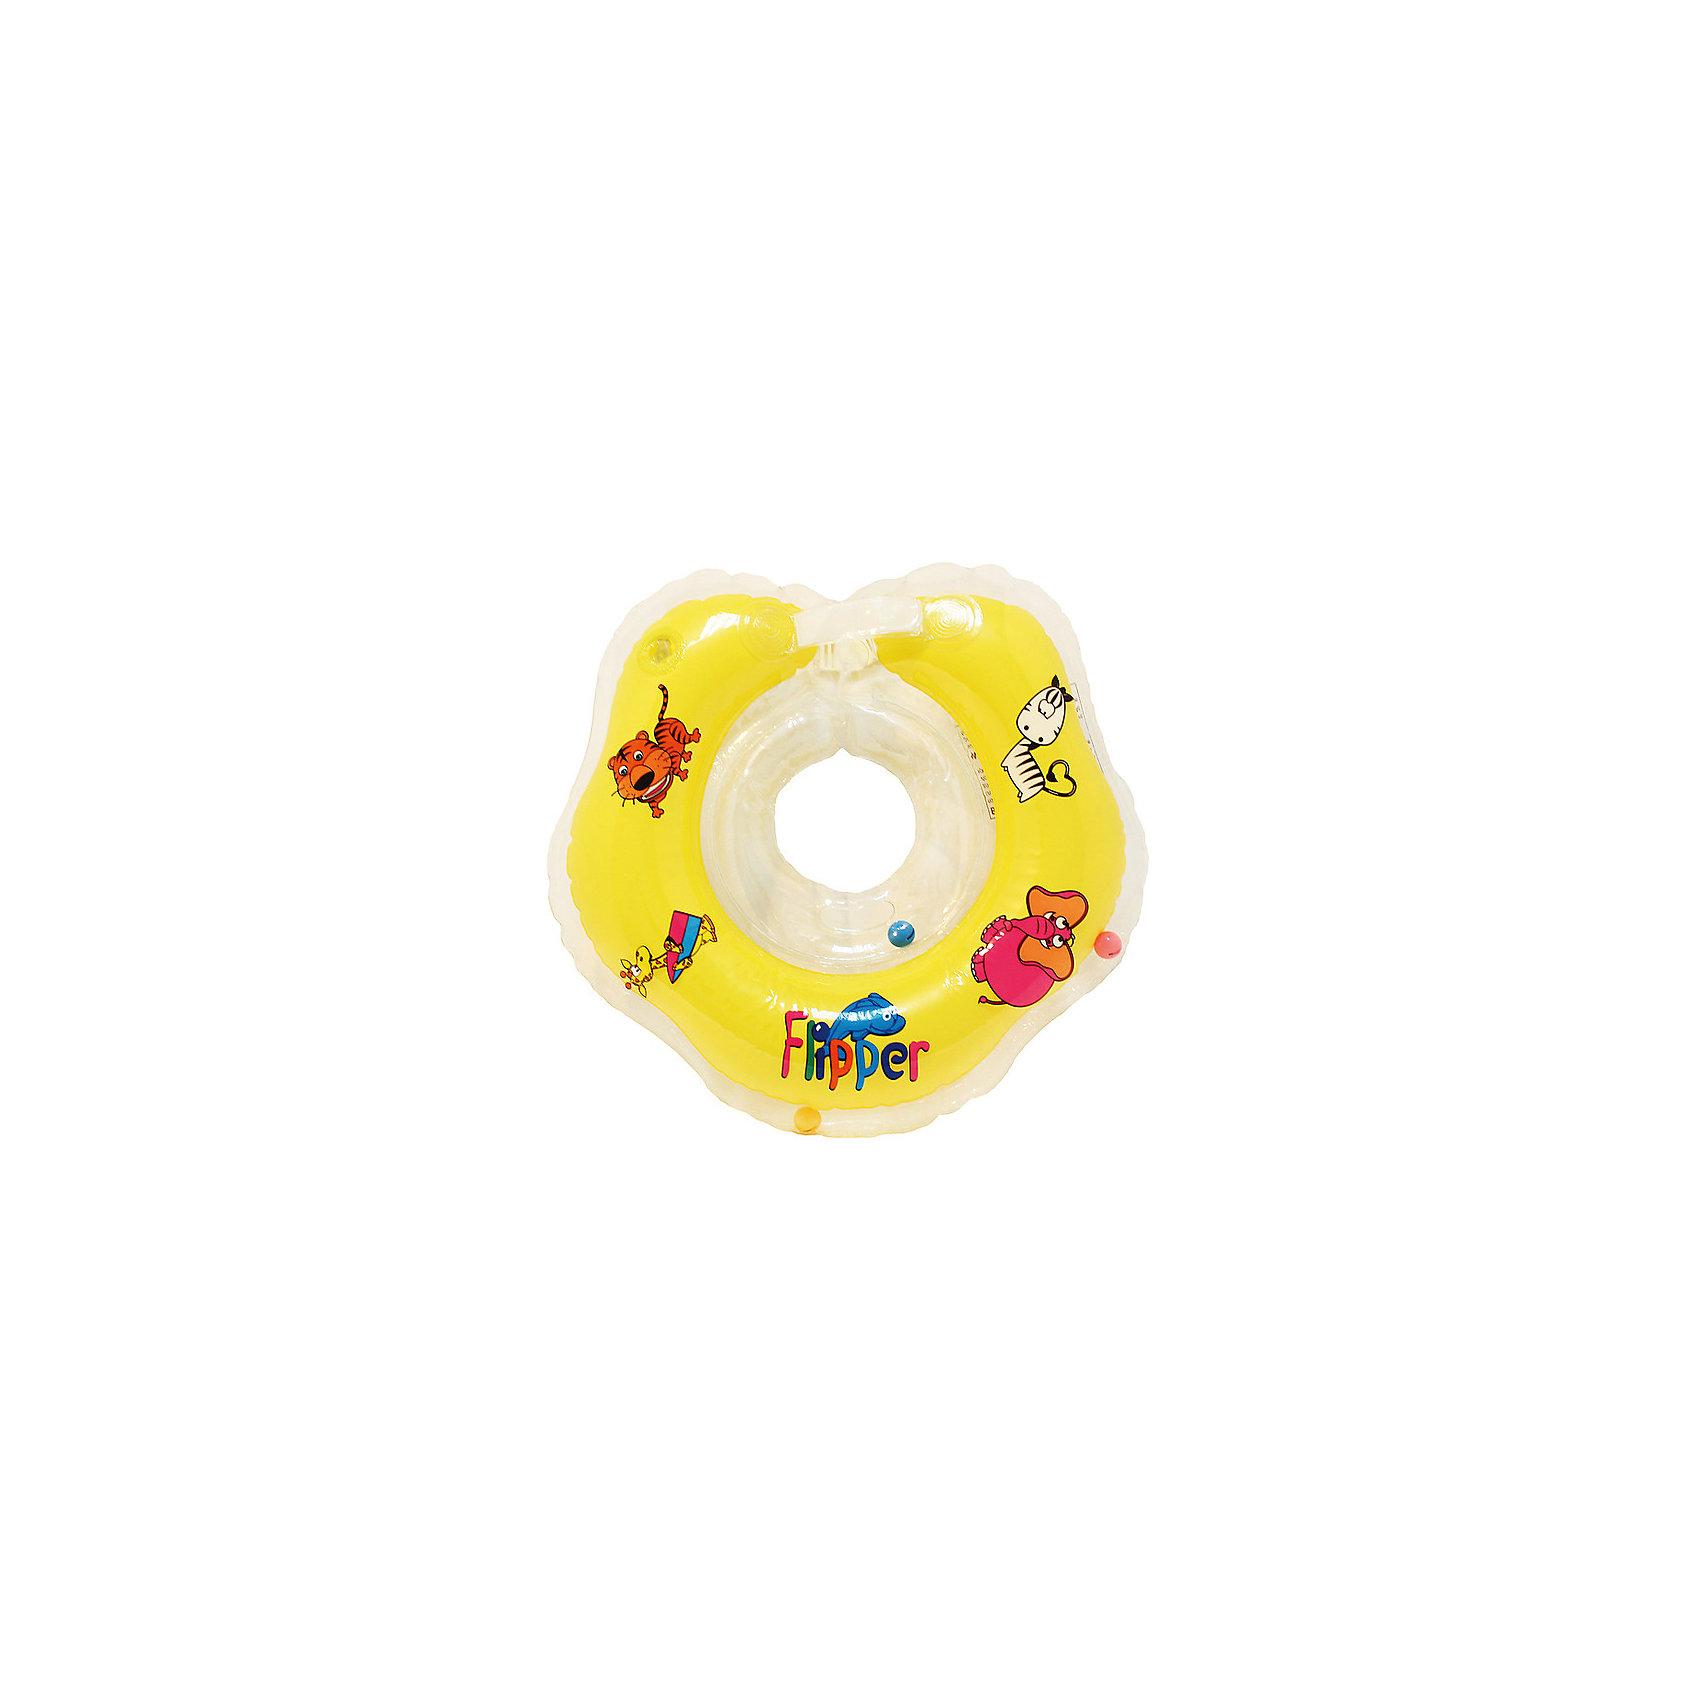 Roxy-Kids Круг на шею Flipper FL001 для купания малышей 0+, Roxy-Kids, roxi kids fl002 круг на шею для купания малышей